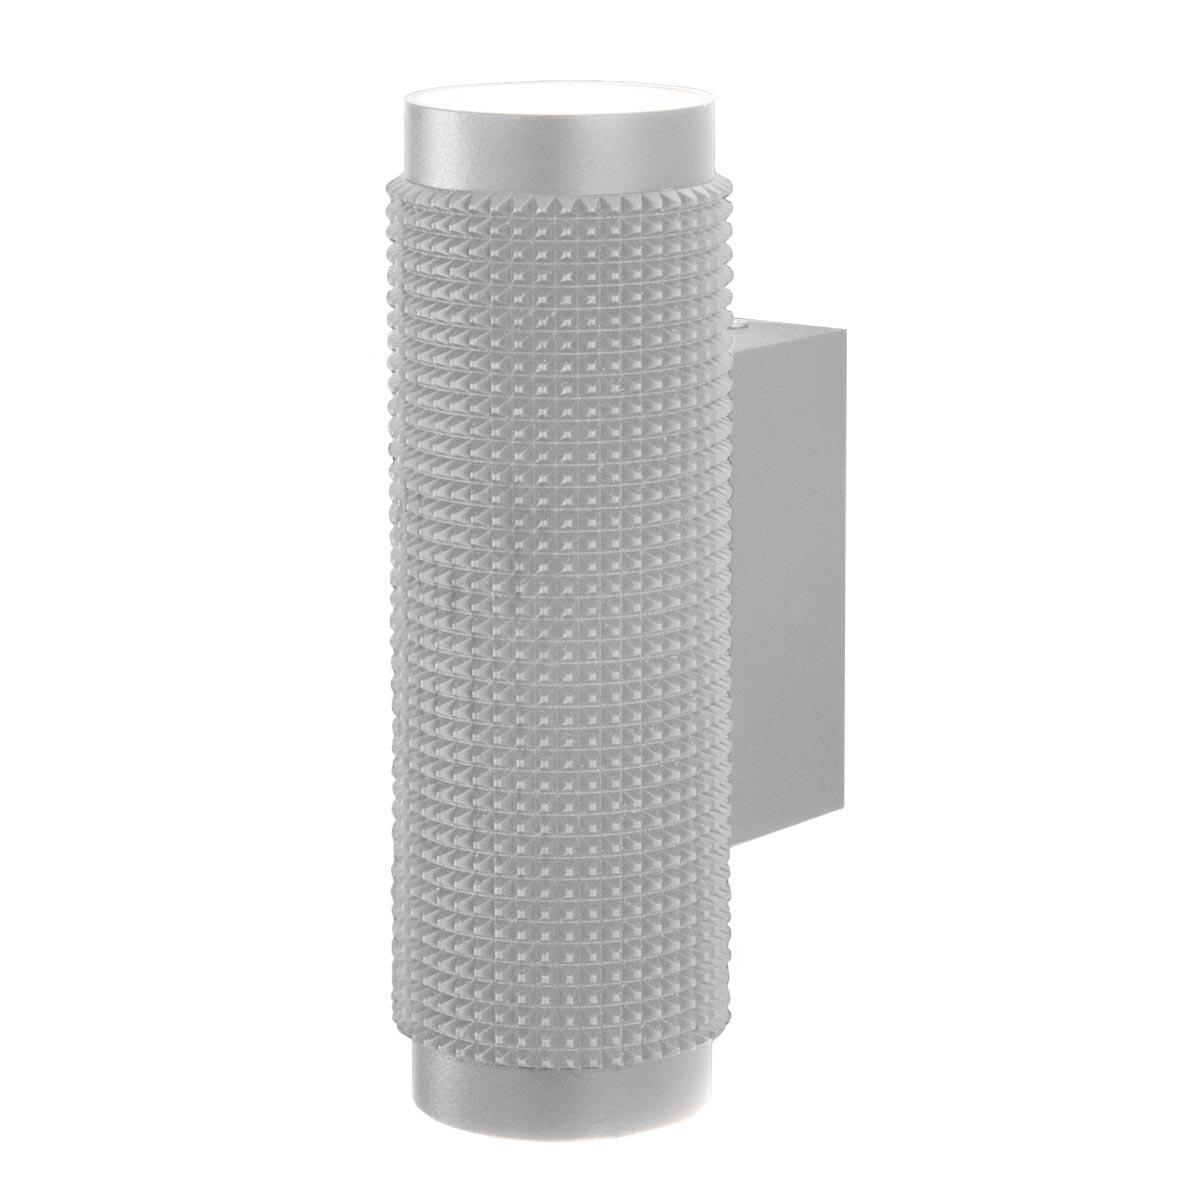 Настенный светильник Elektrostandard Spike MRL 1014 GU10 SW серебро 4690389153327